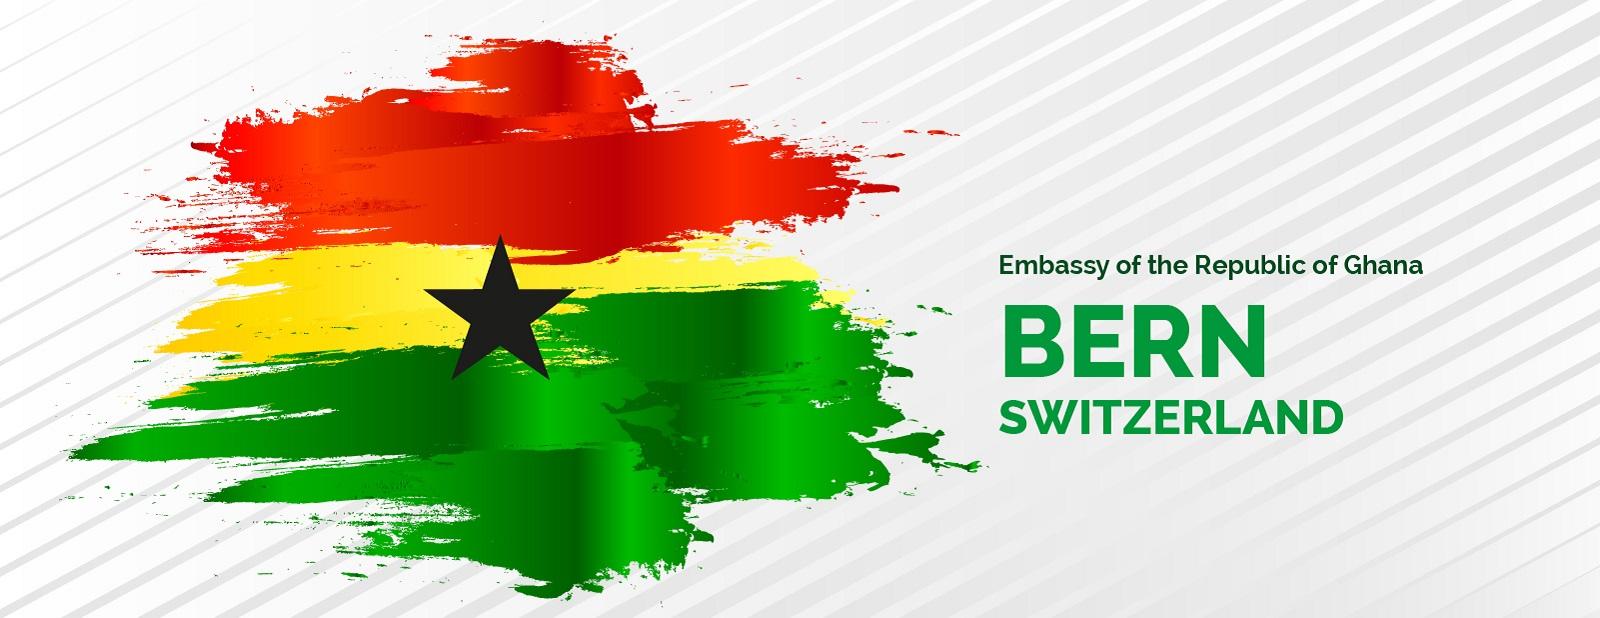 Ghana Embassy Bern poster 1